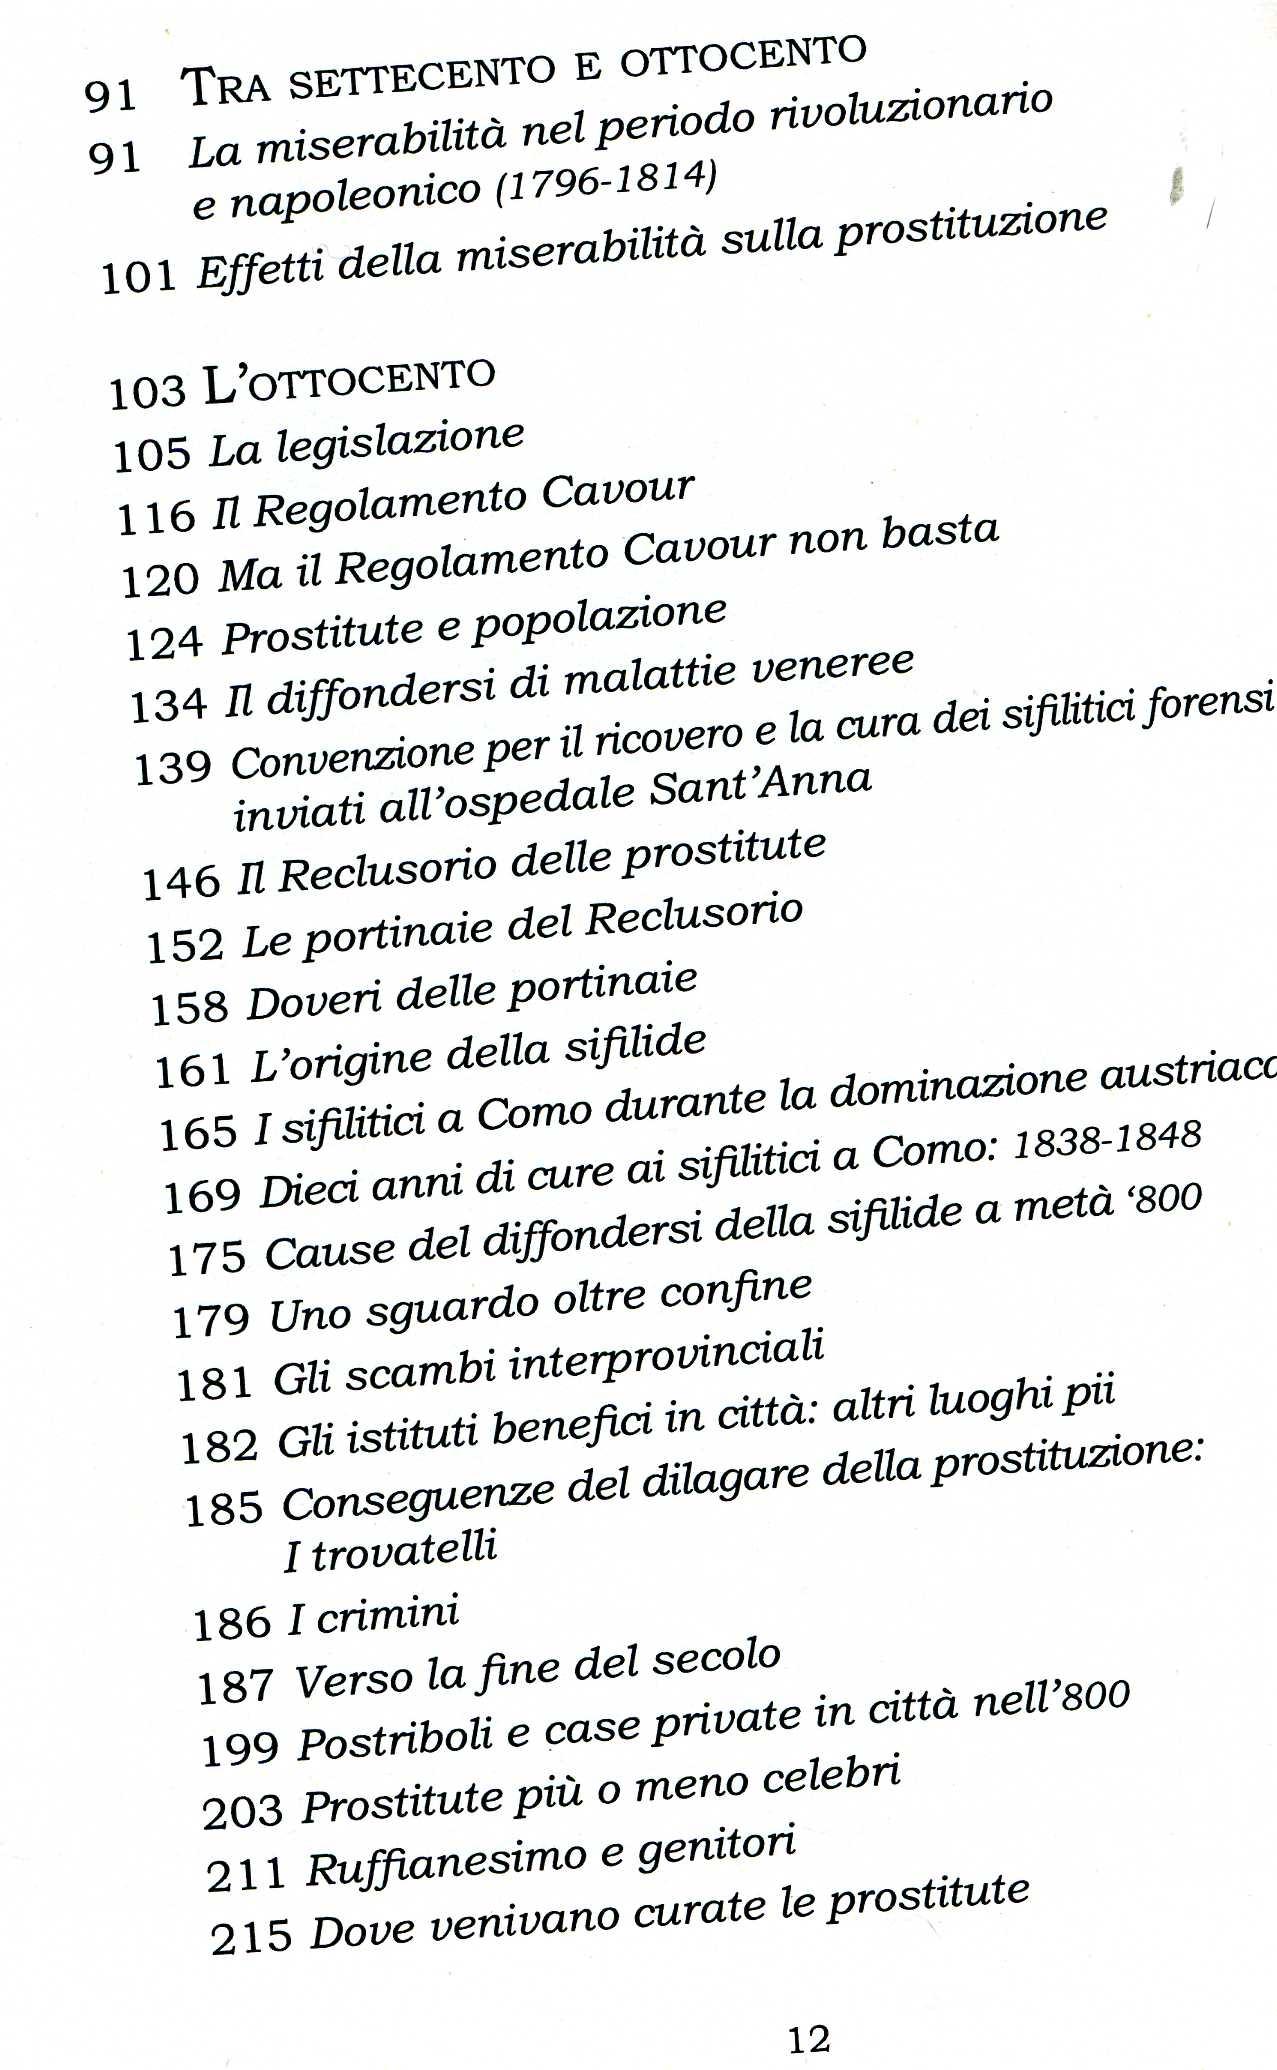 prostituzione in svizzera è legale chat sex italiana